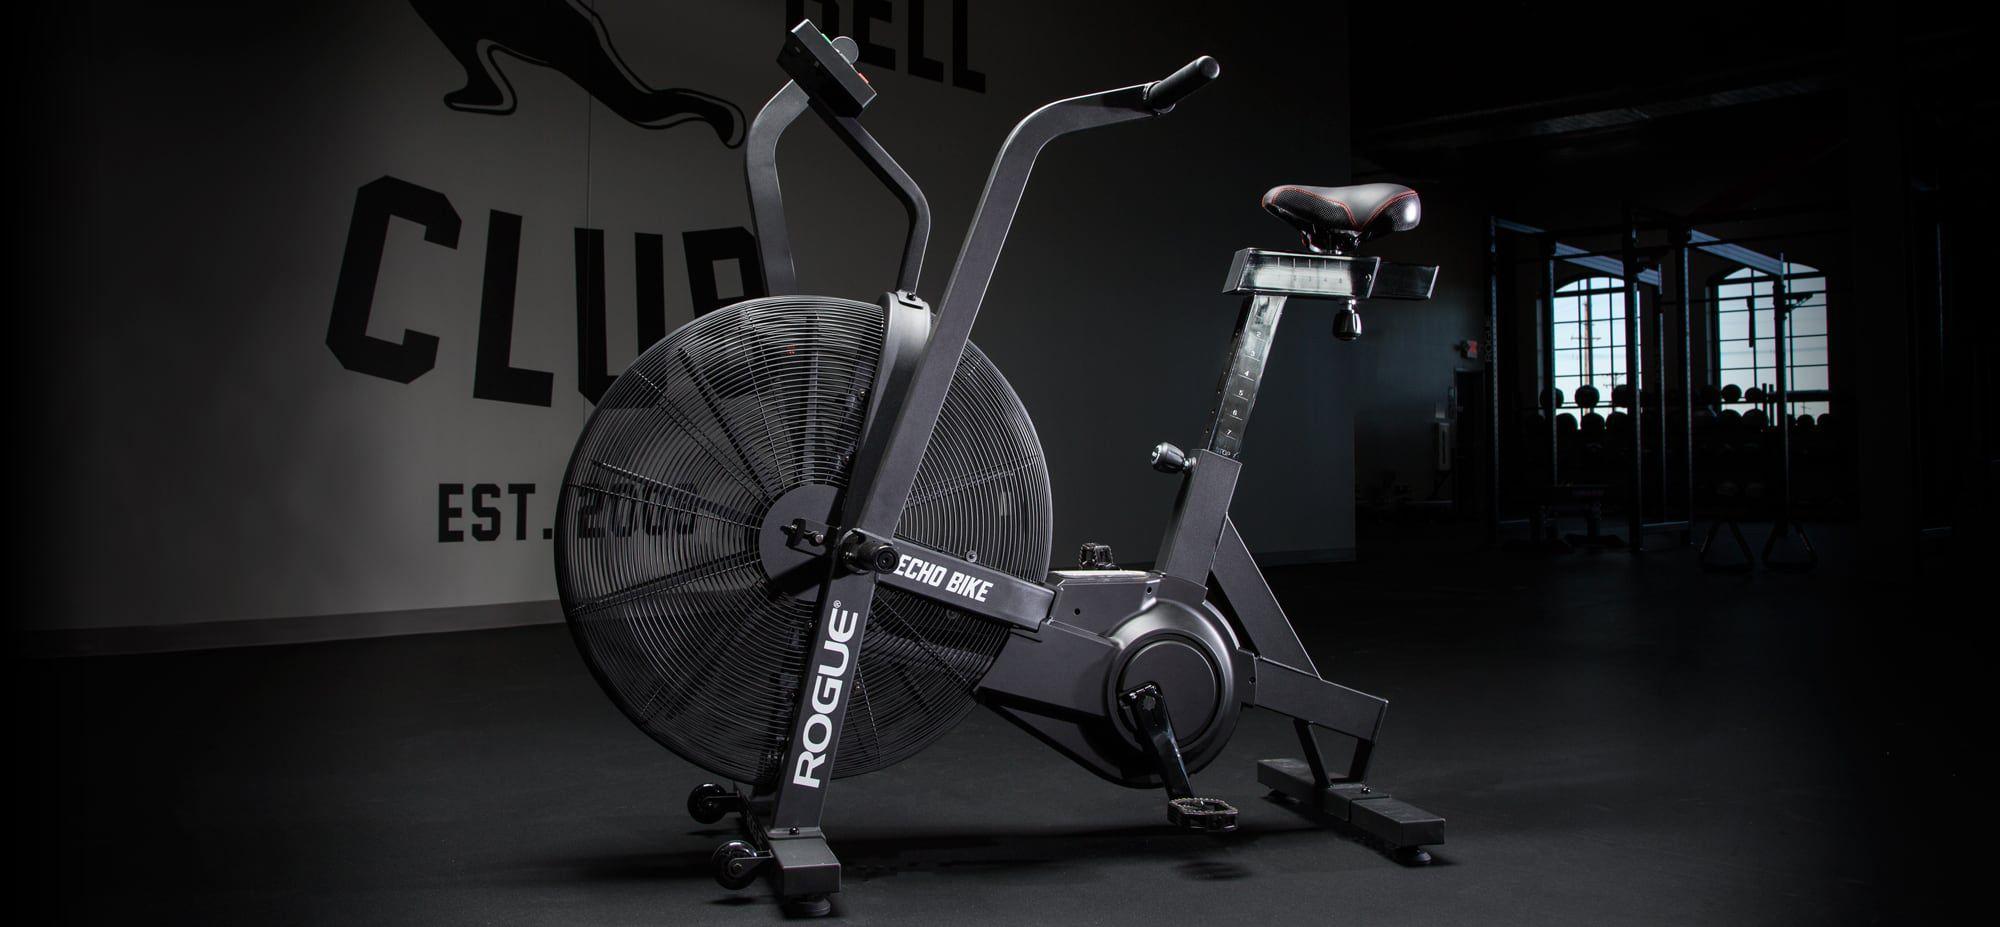 Rogue Echo Bike Rogue Fitness Bike, Exercise bikes